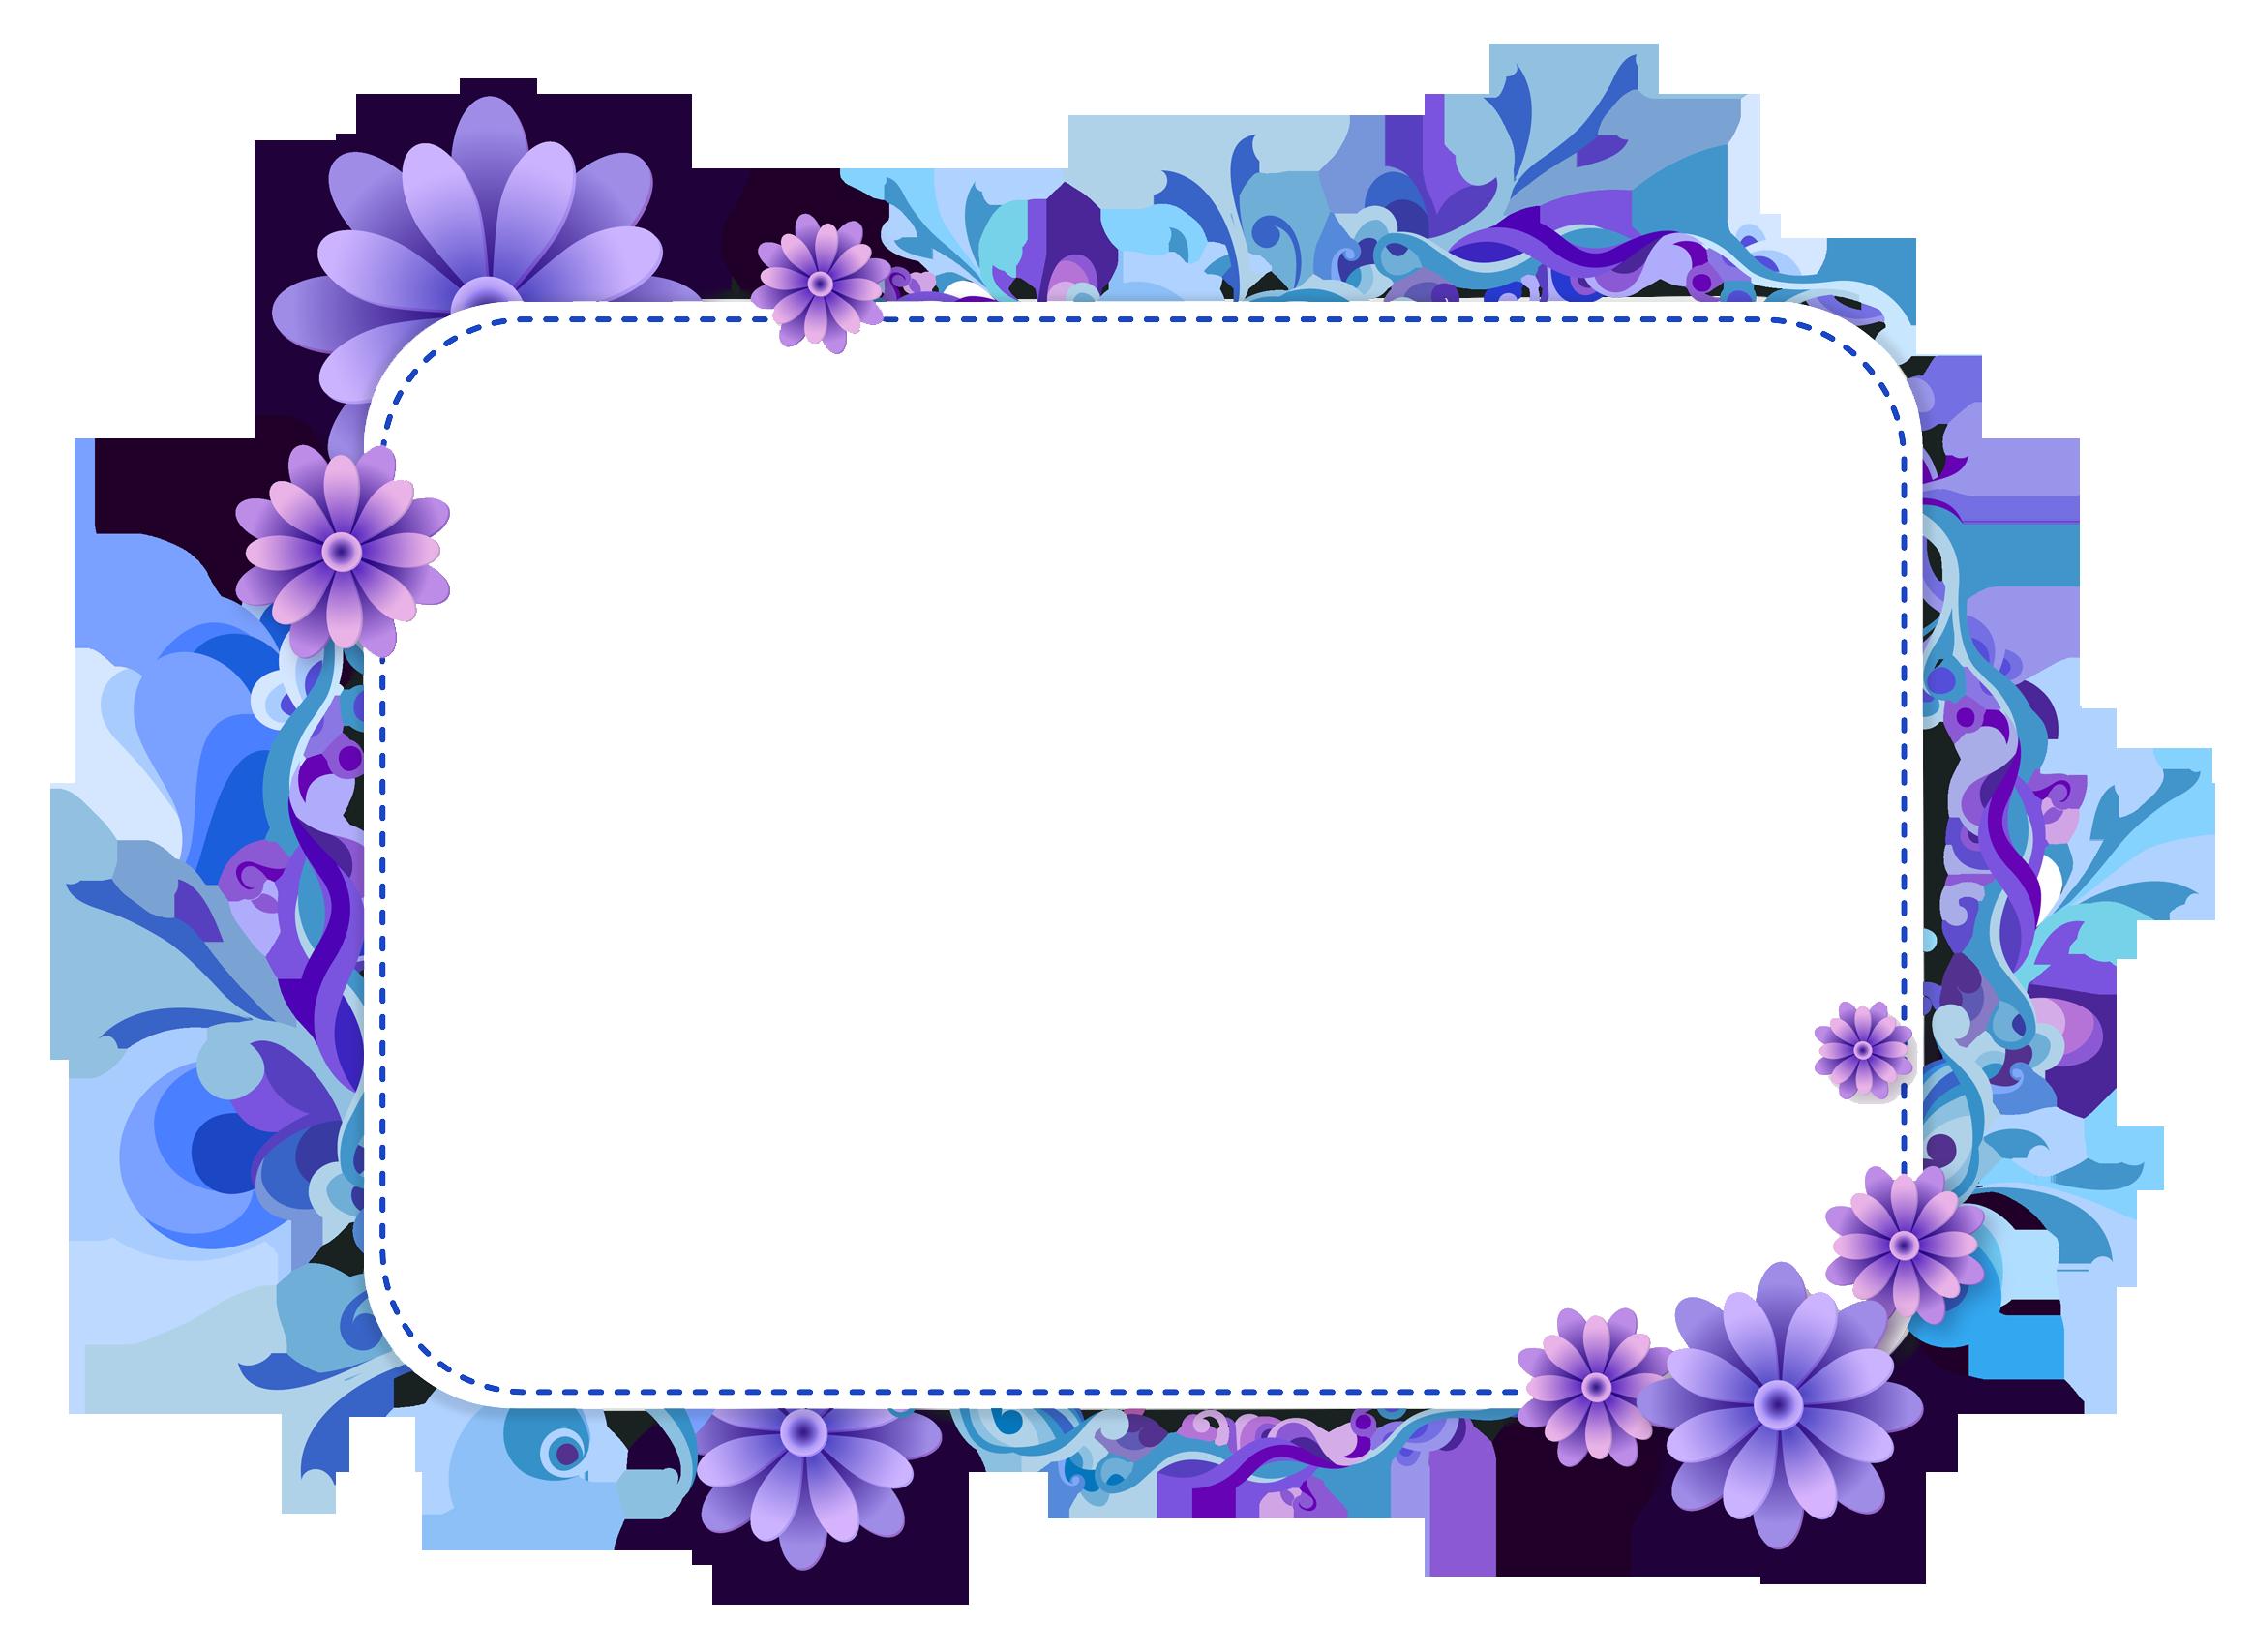 Transparent Flower Border | Images Guru